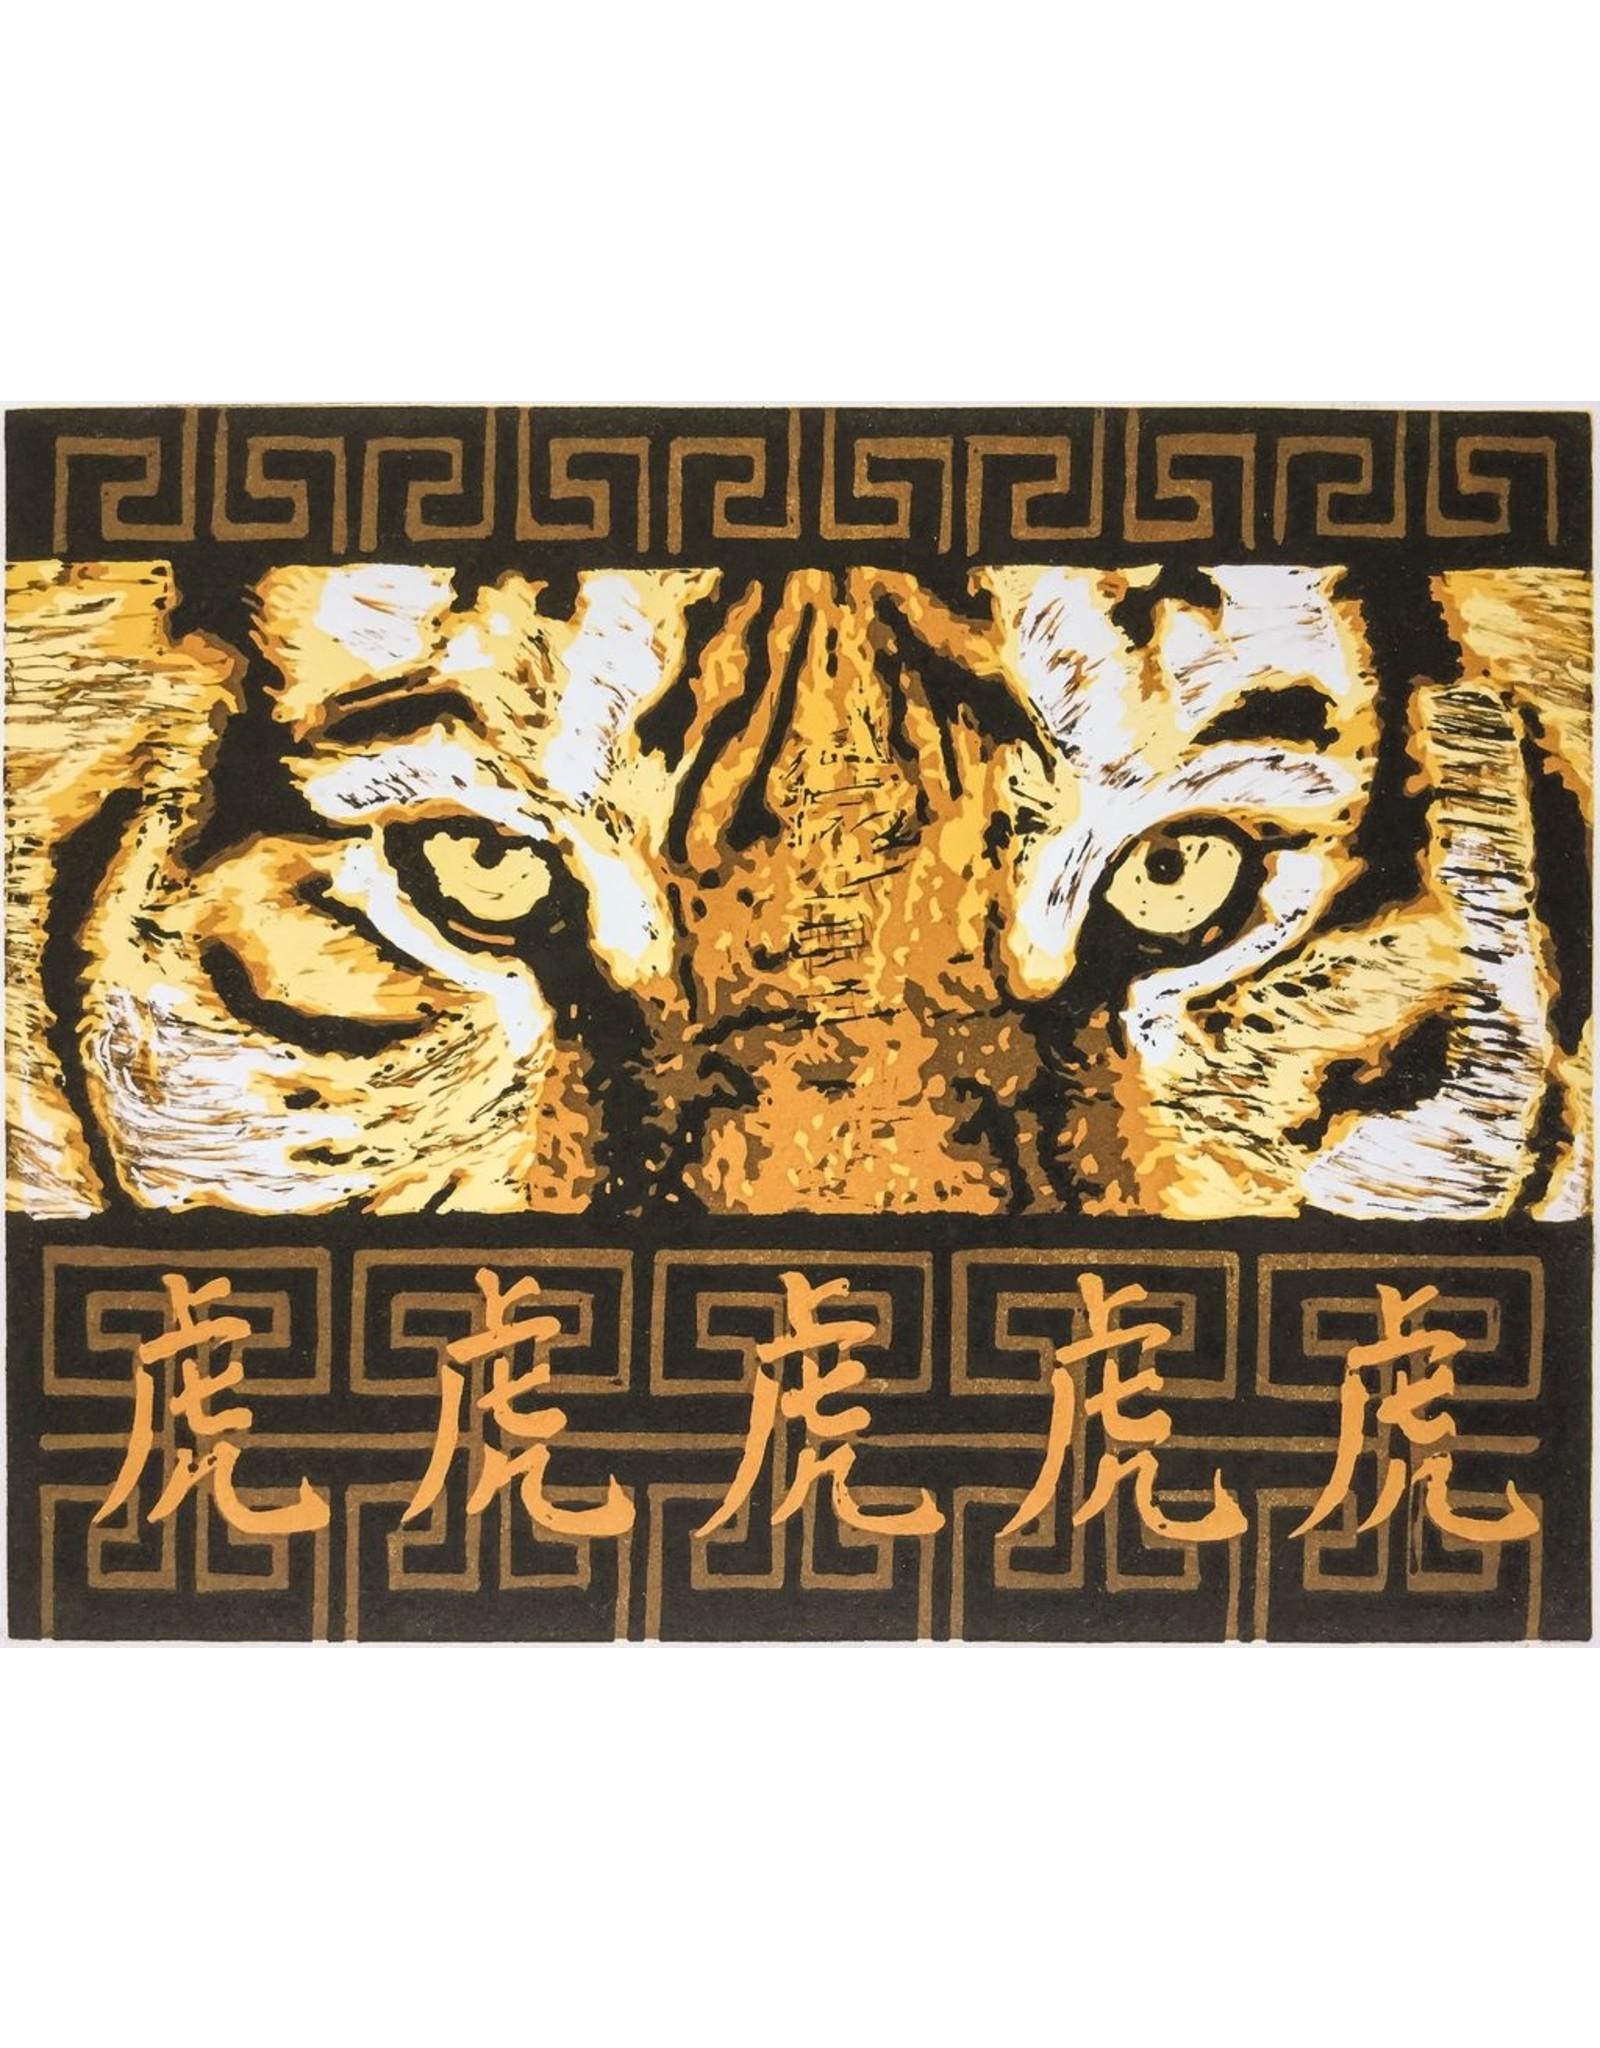 Howorth, E.J. 5 Tigers, E.J. Howorth